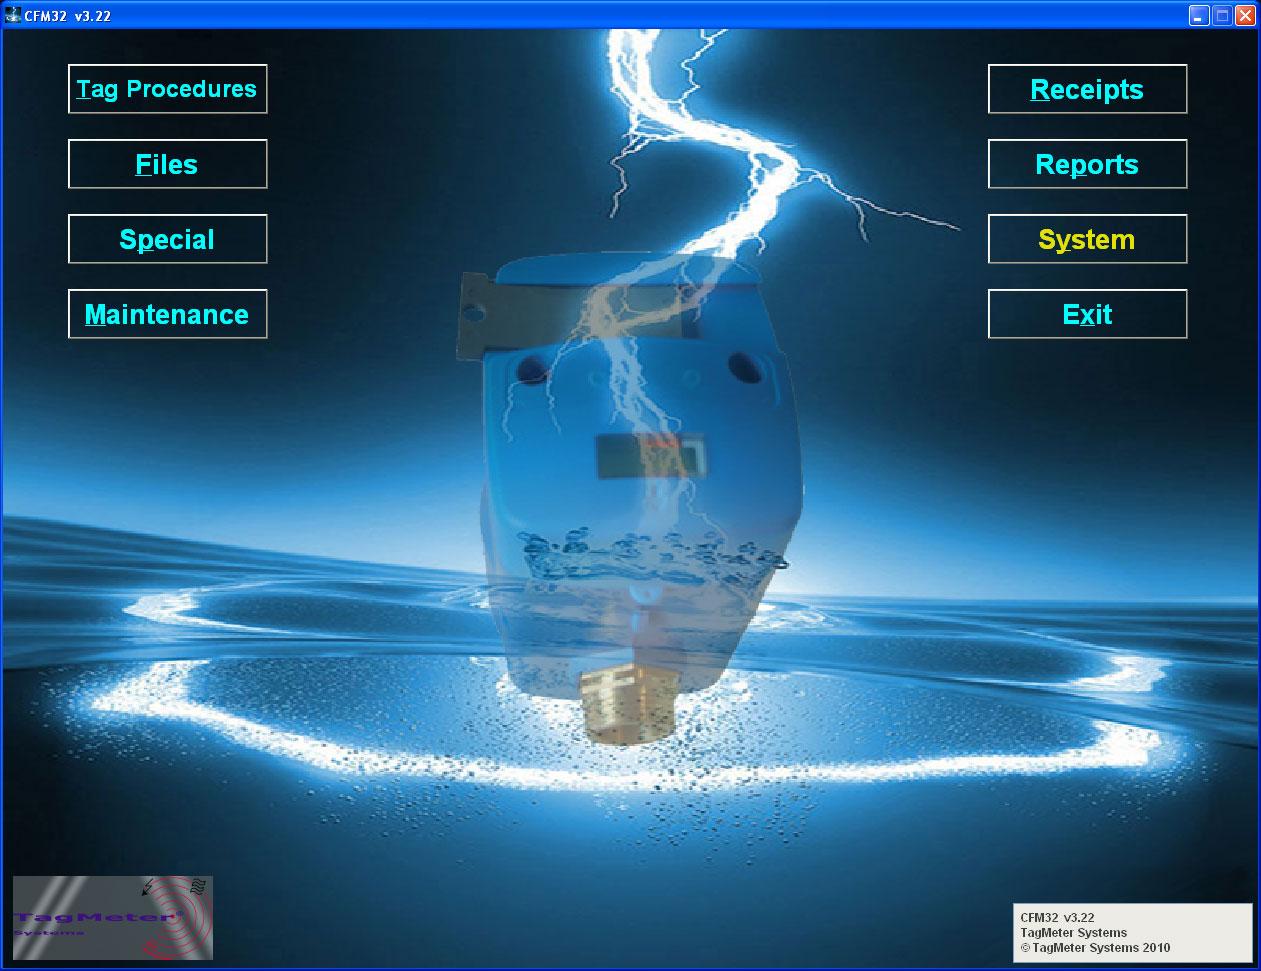 Cashflow  Management System CFM32